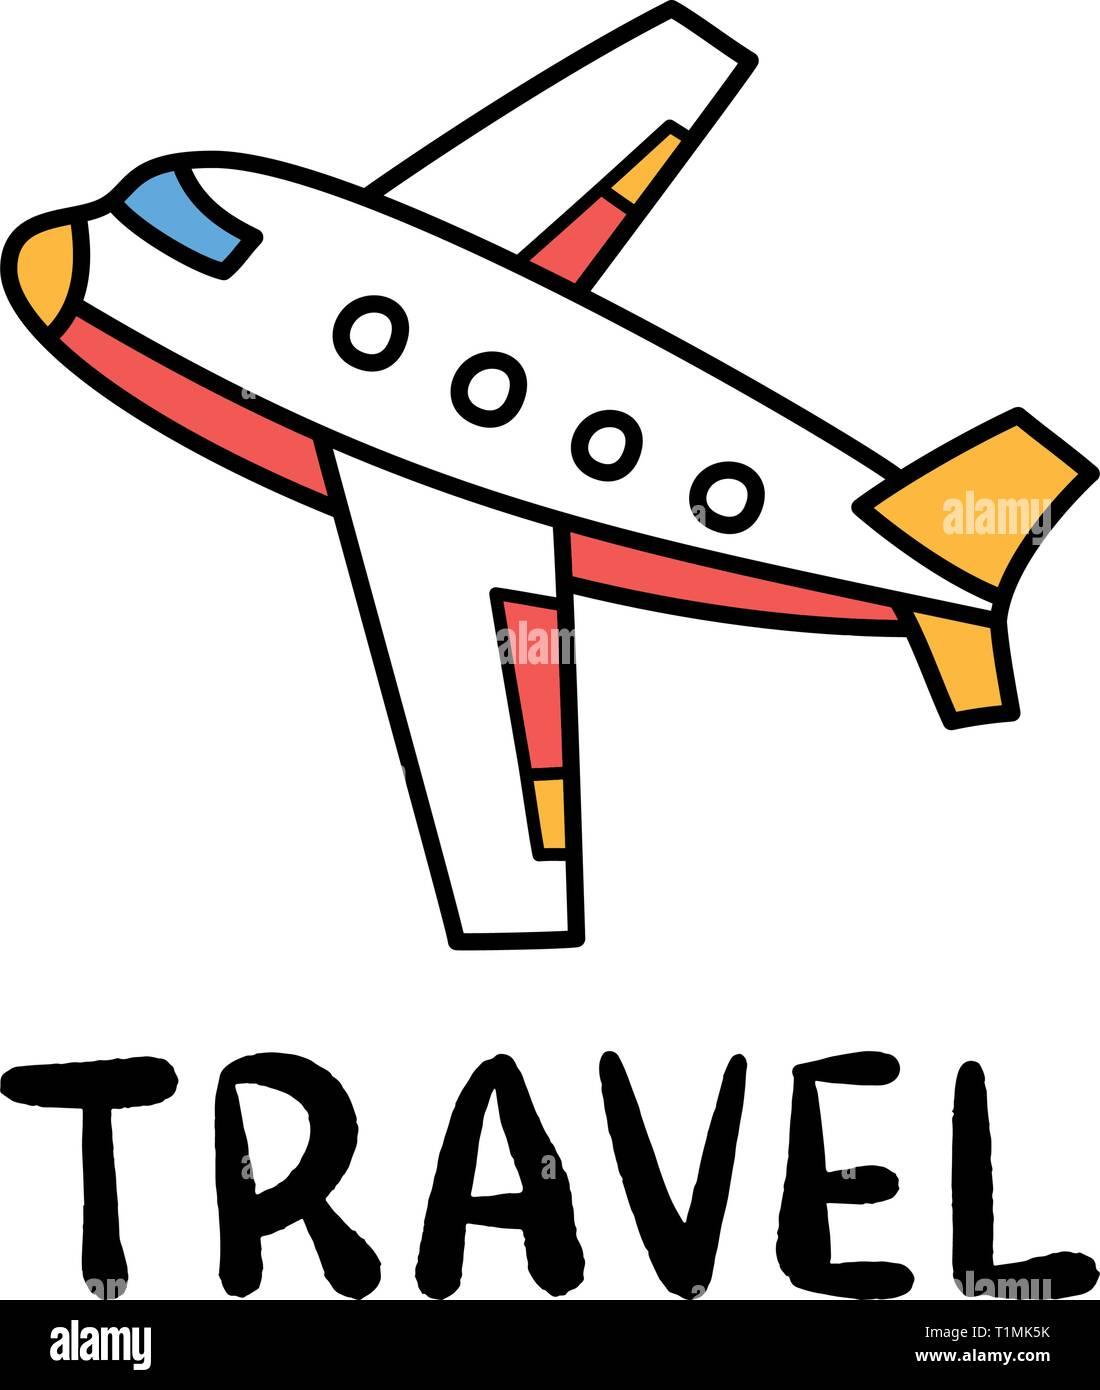 Cartoon Travel Plane Doodle Lettering For Decoration Design